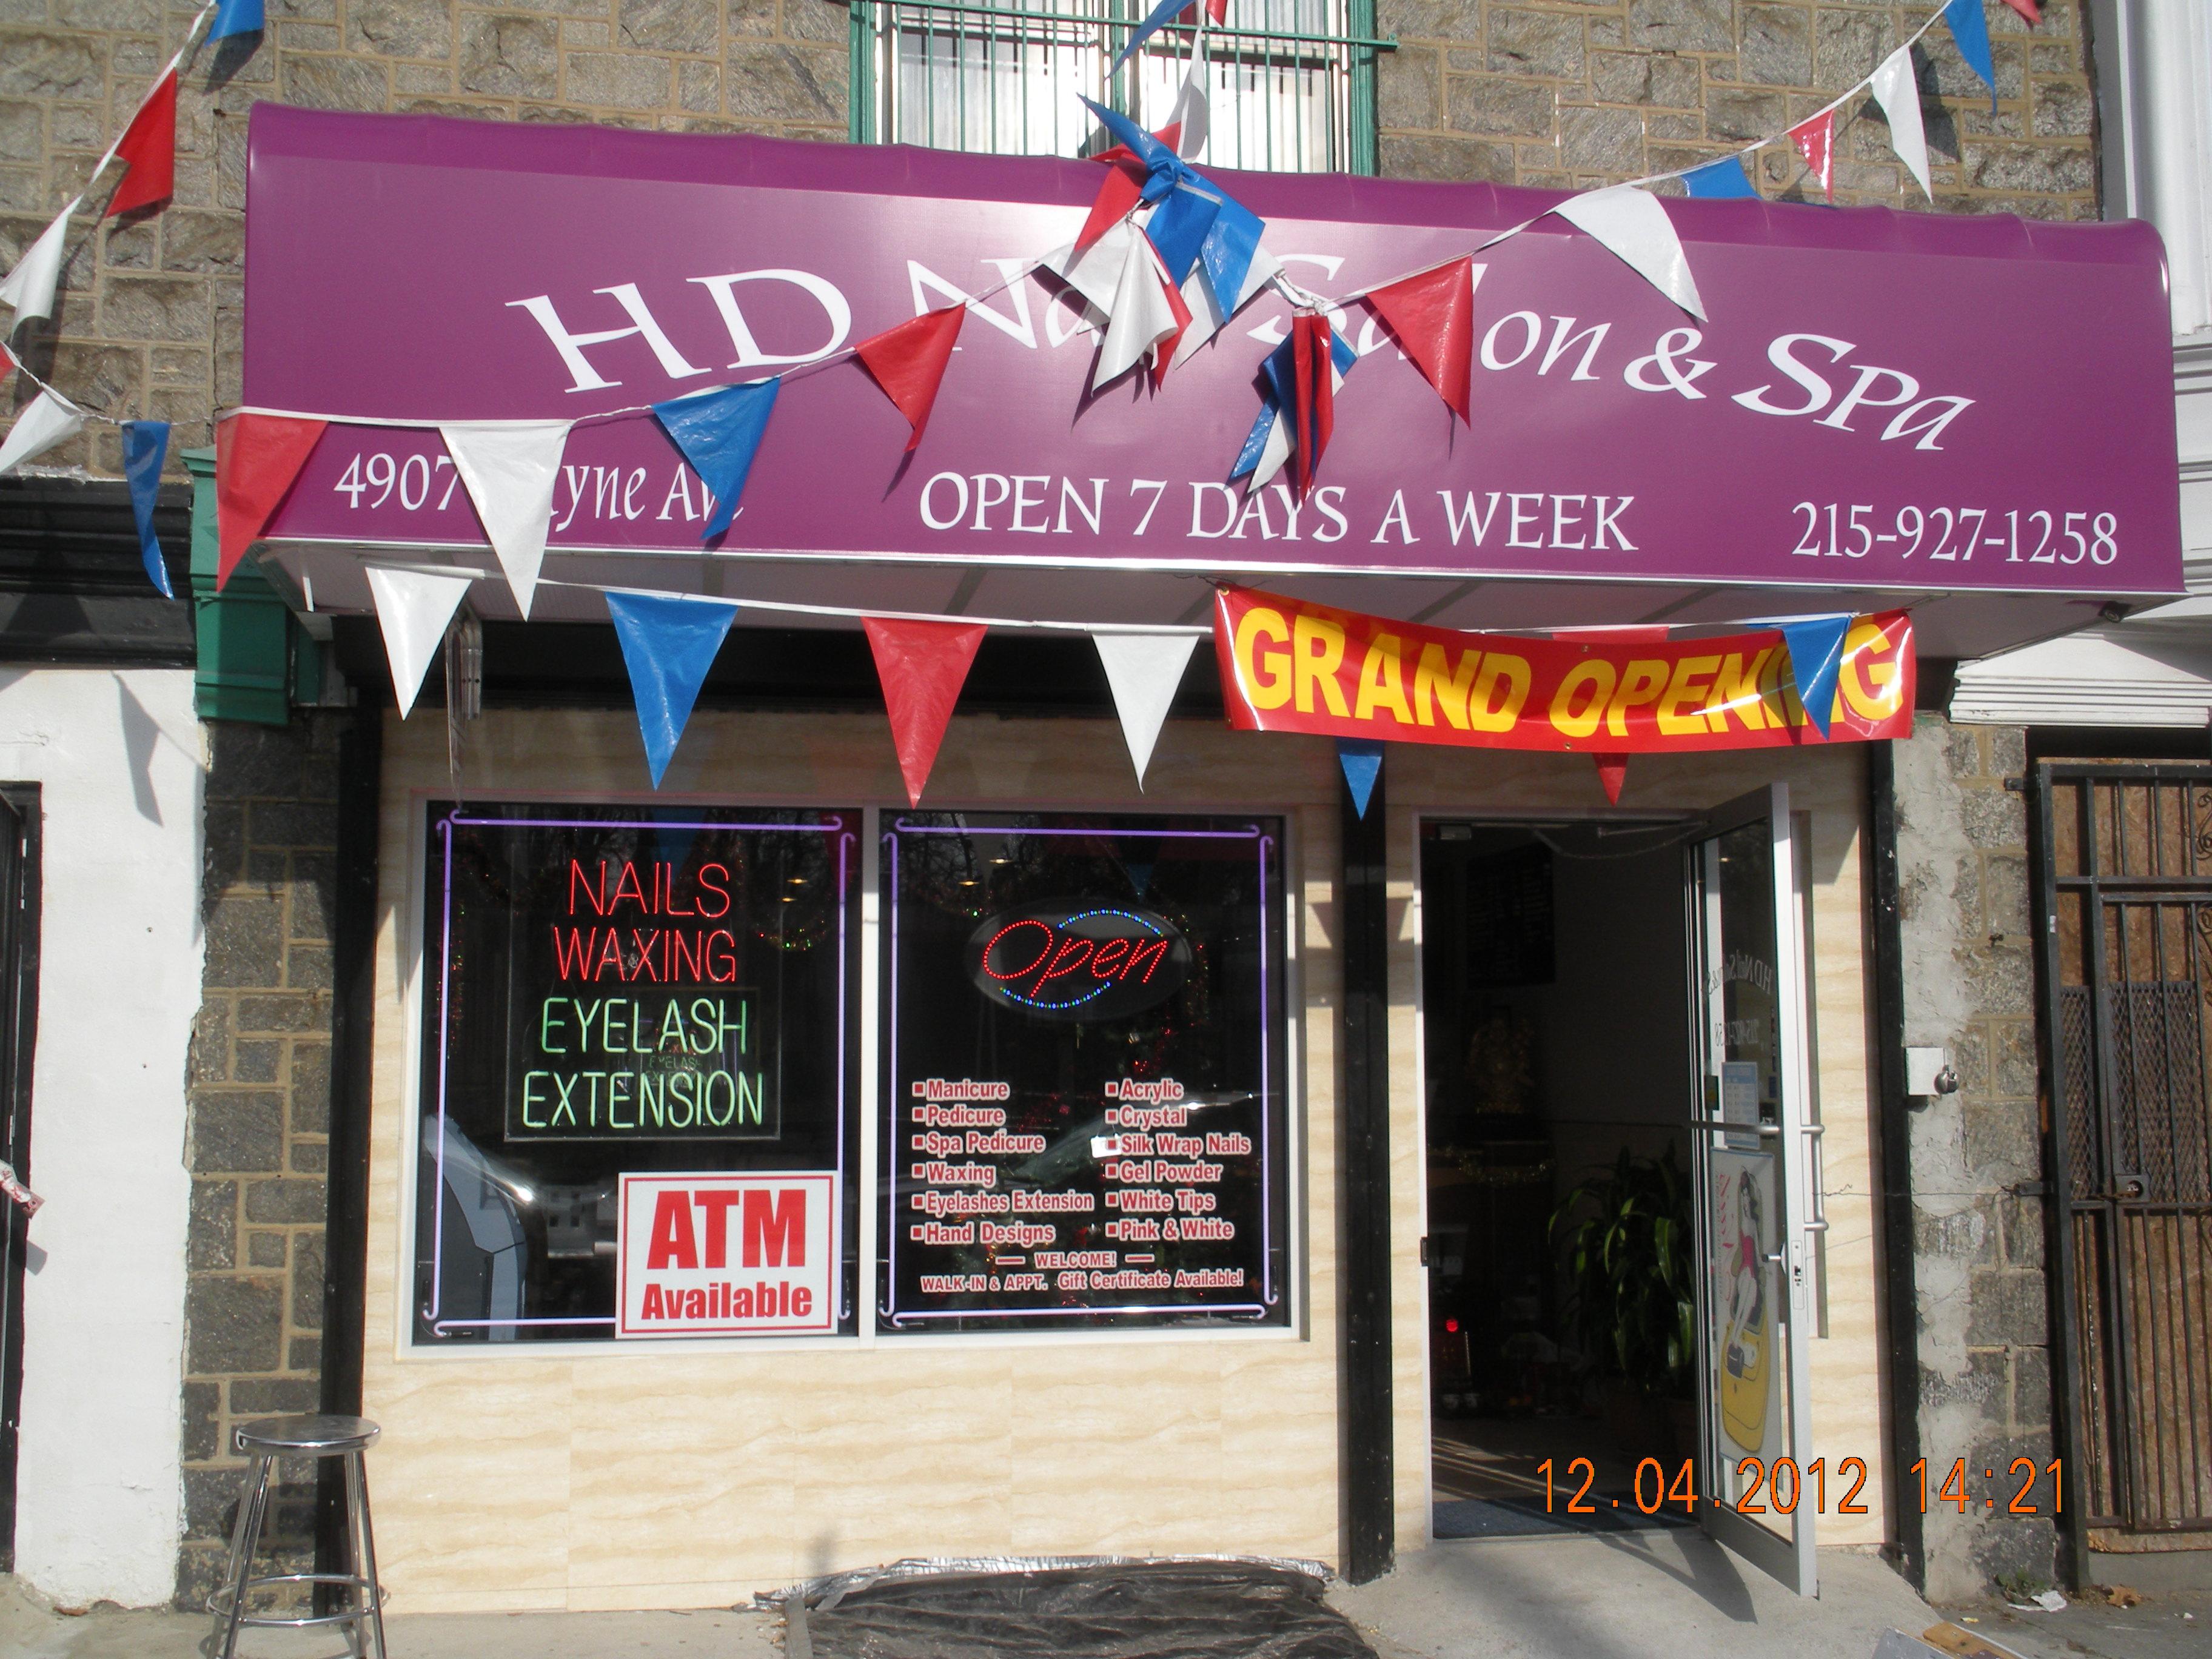 HD Nail Salon & Spa Grand Opening! | Advance To Go LLC